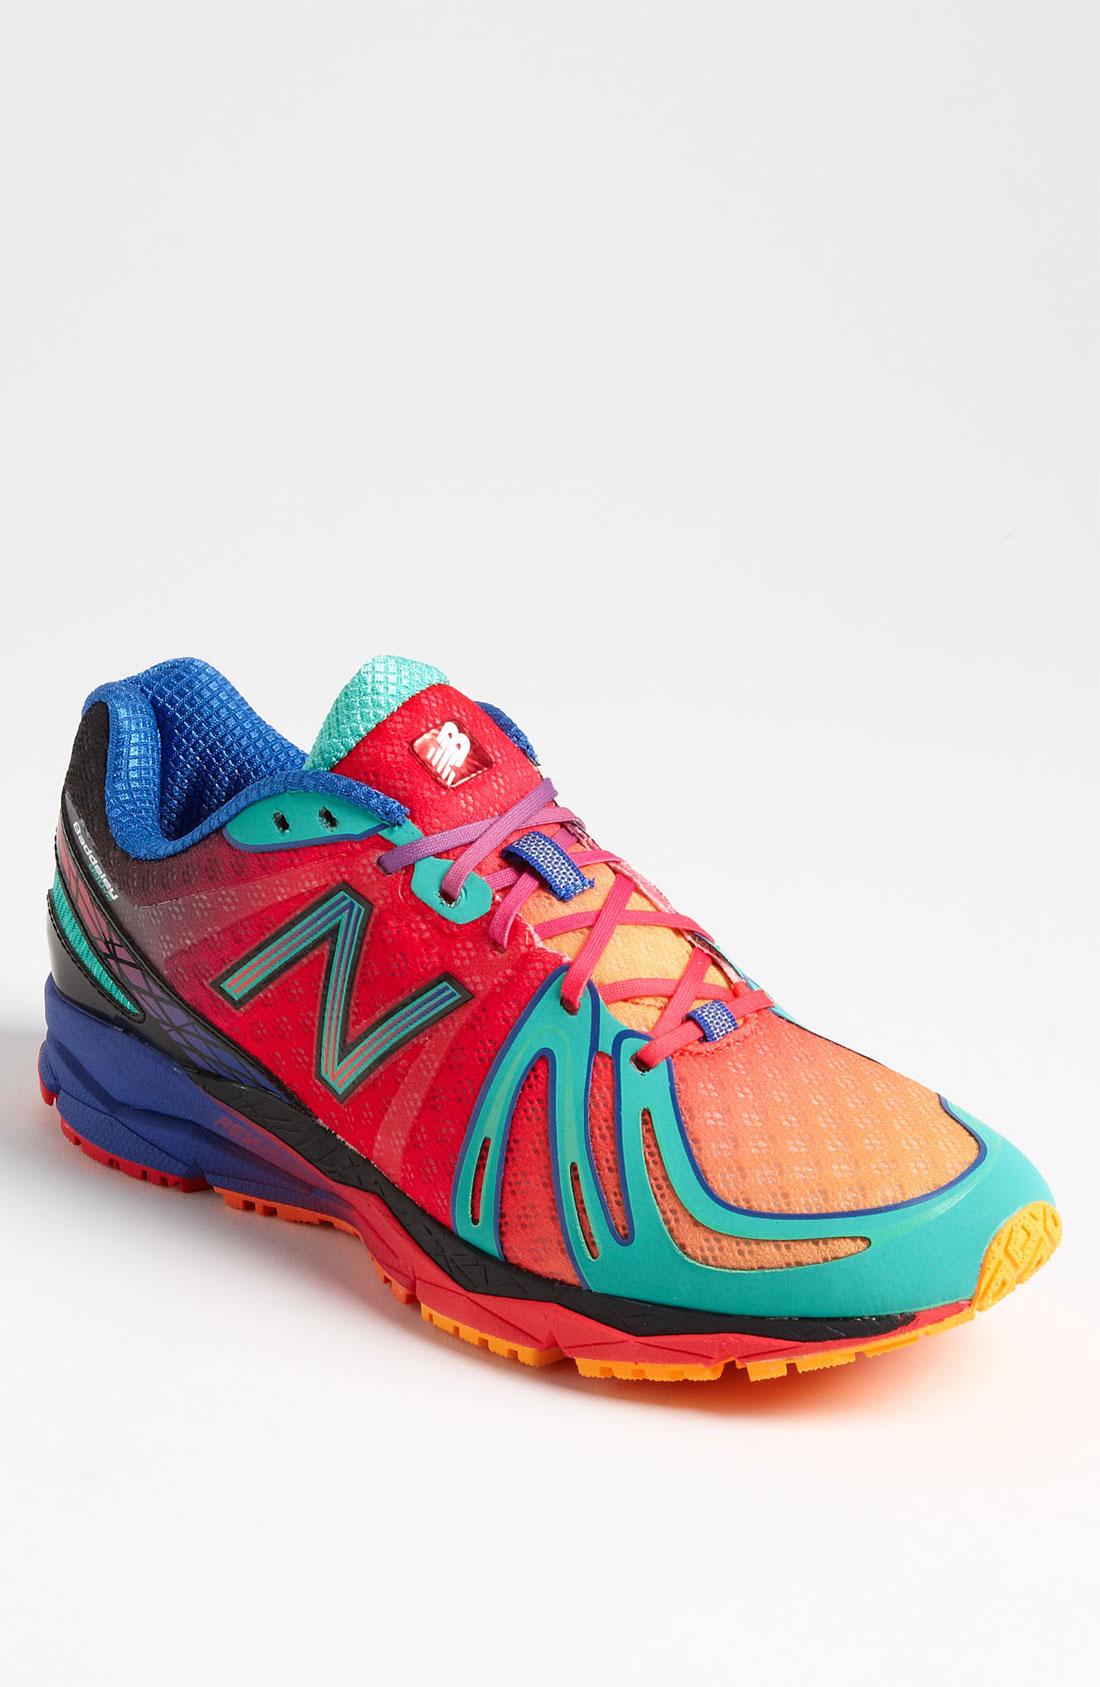 New Balance Designer Shoes